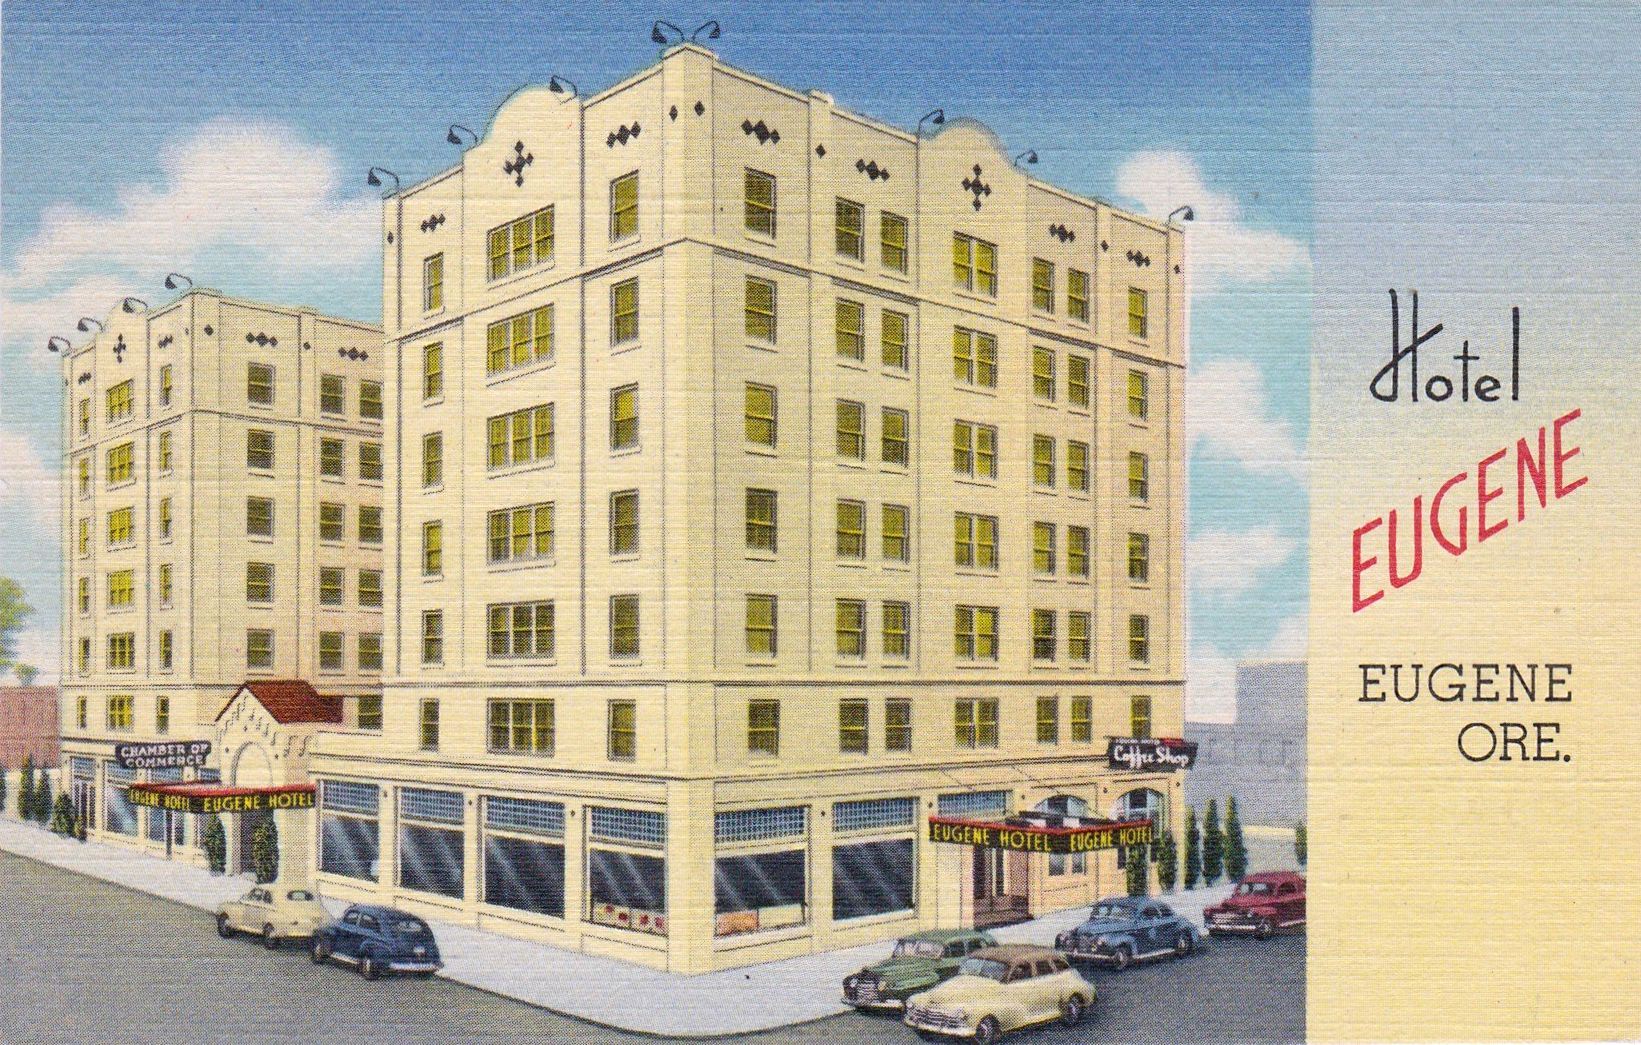 Eugene Hotel Eugene Or 1949 200 Rooms Of Real Comfort Strictly Fireproof Building Exceptional Cuisine And Service Complete Postcard Eugene Hotel